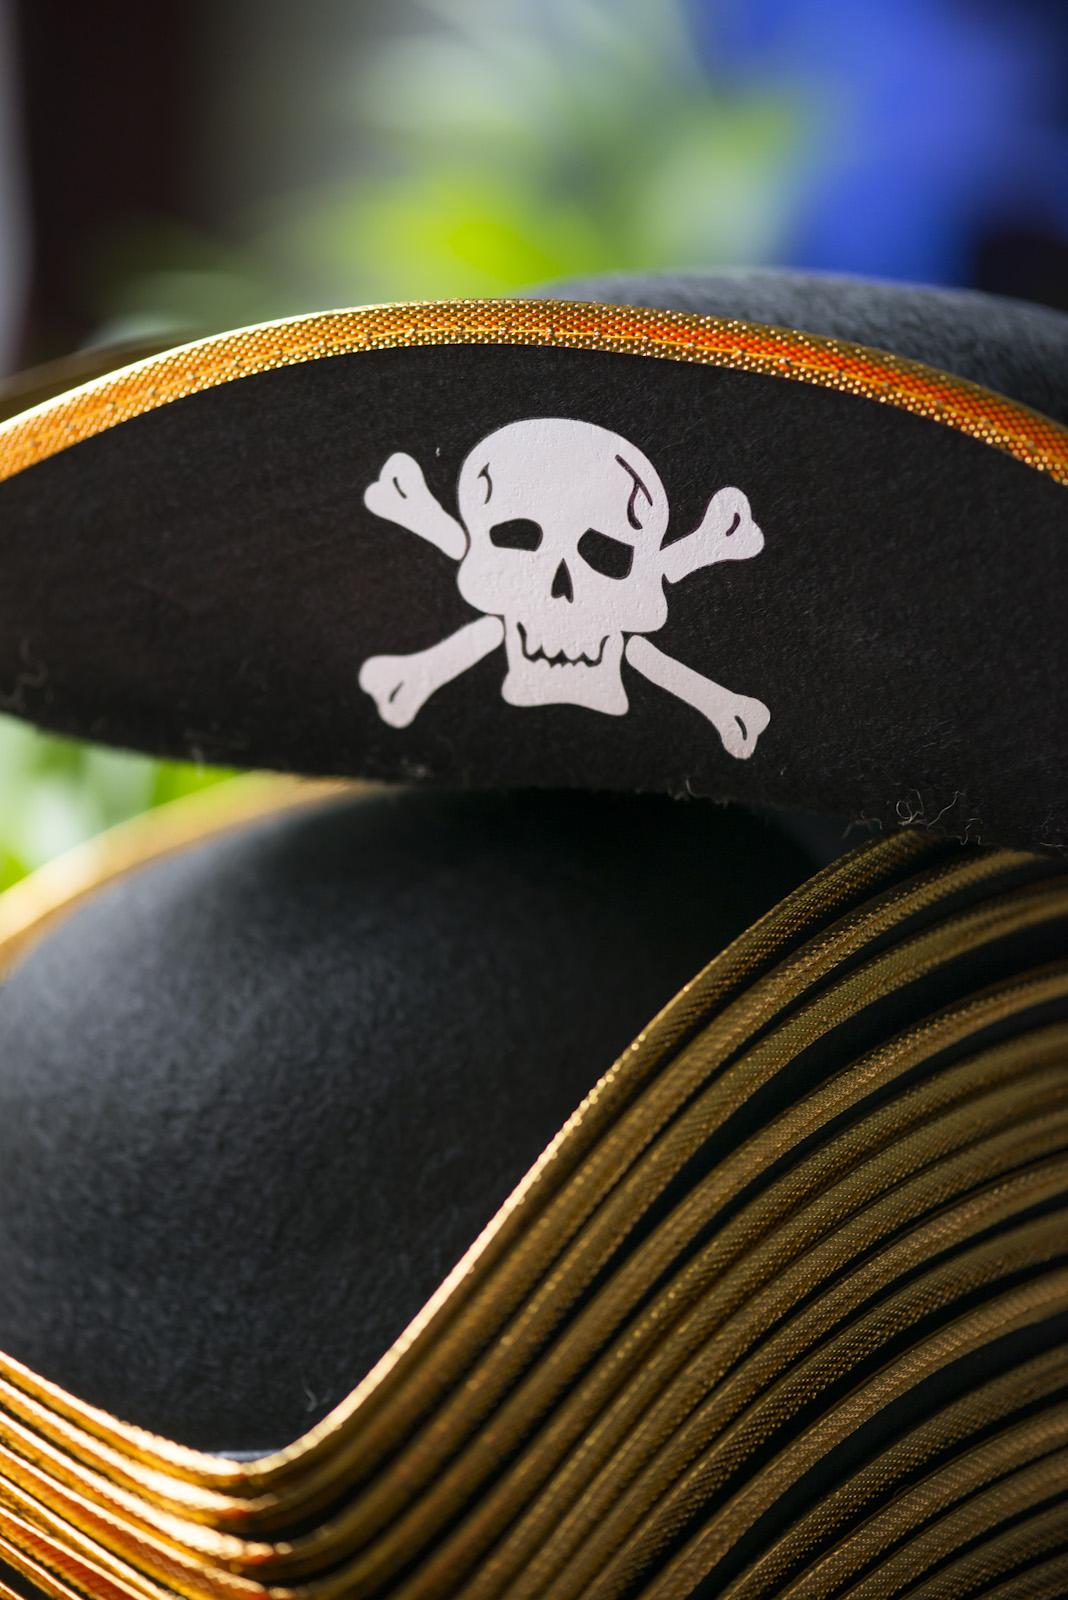 014DSC_6301 boston pirate.jpg